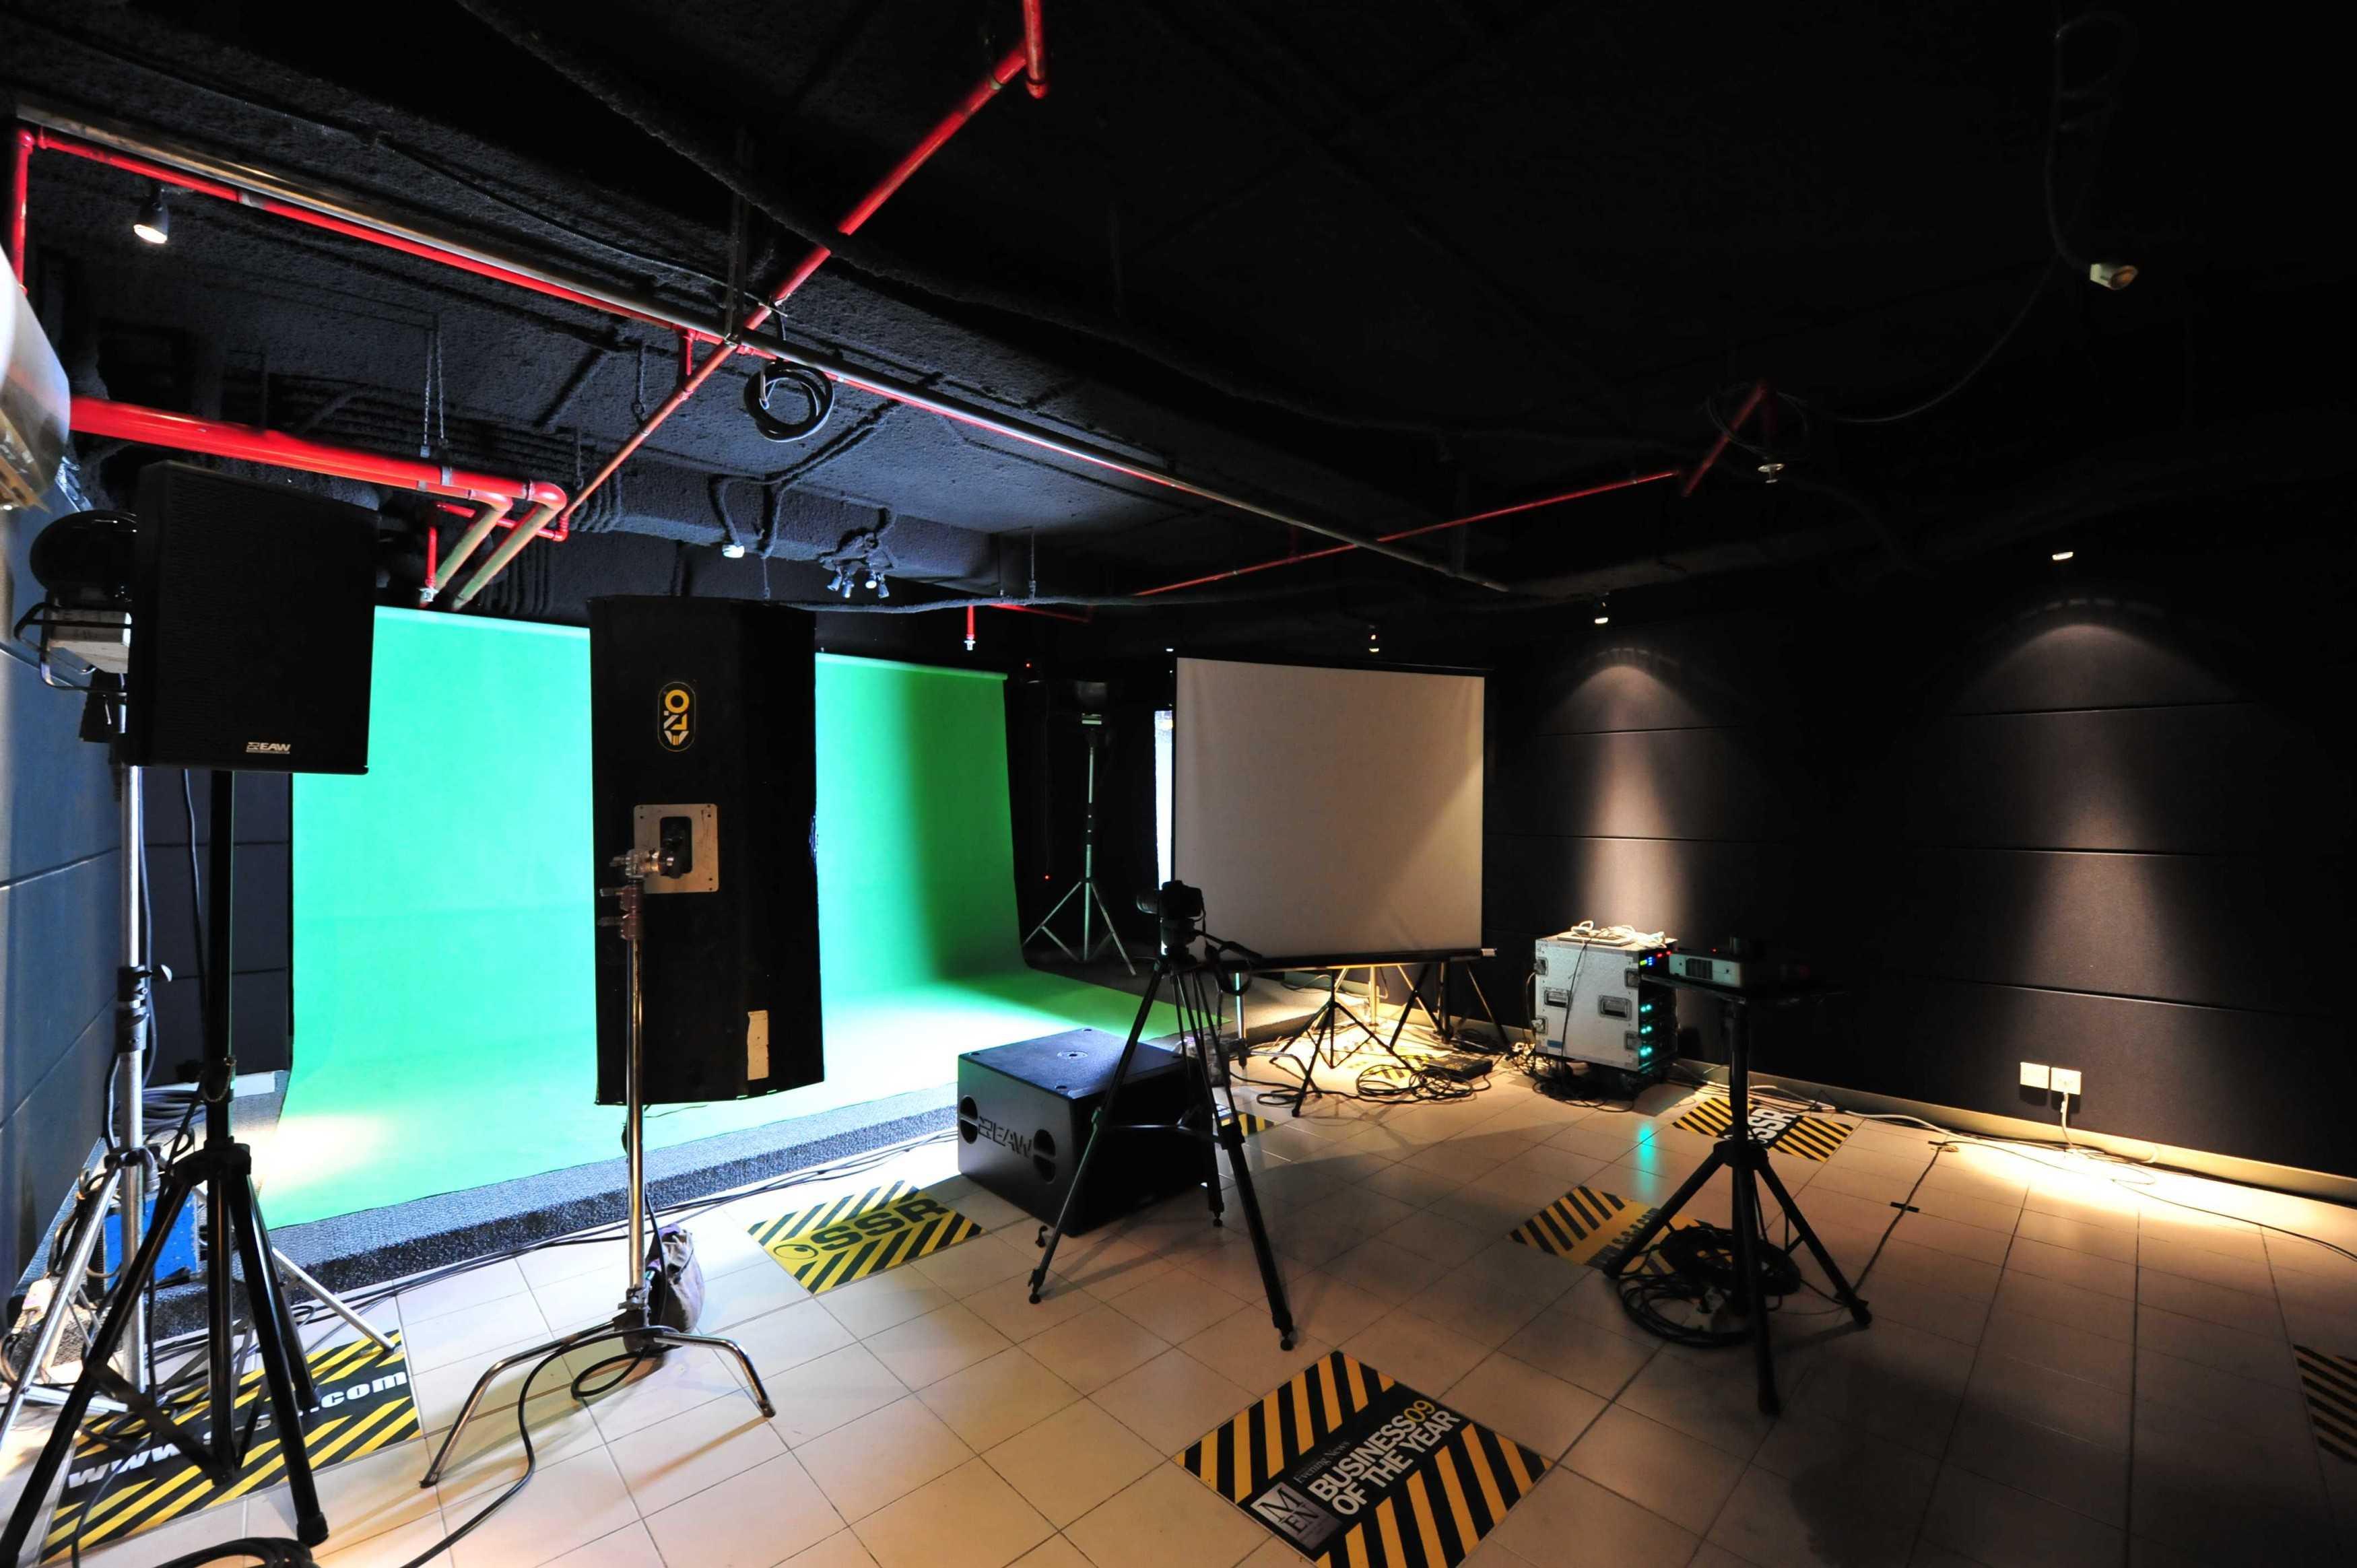 Aqustica Ssr School Of Sound Recording Jakarta Jakarta, Indonesia Jakarta, Indonesia 19-Green-Room Modern  29760